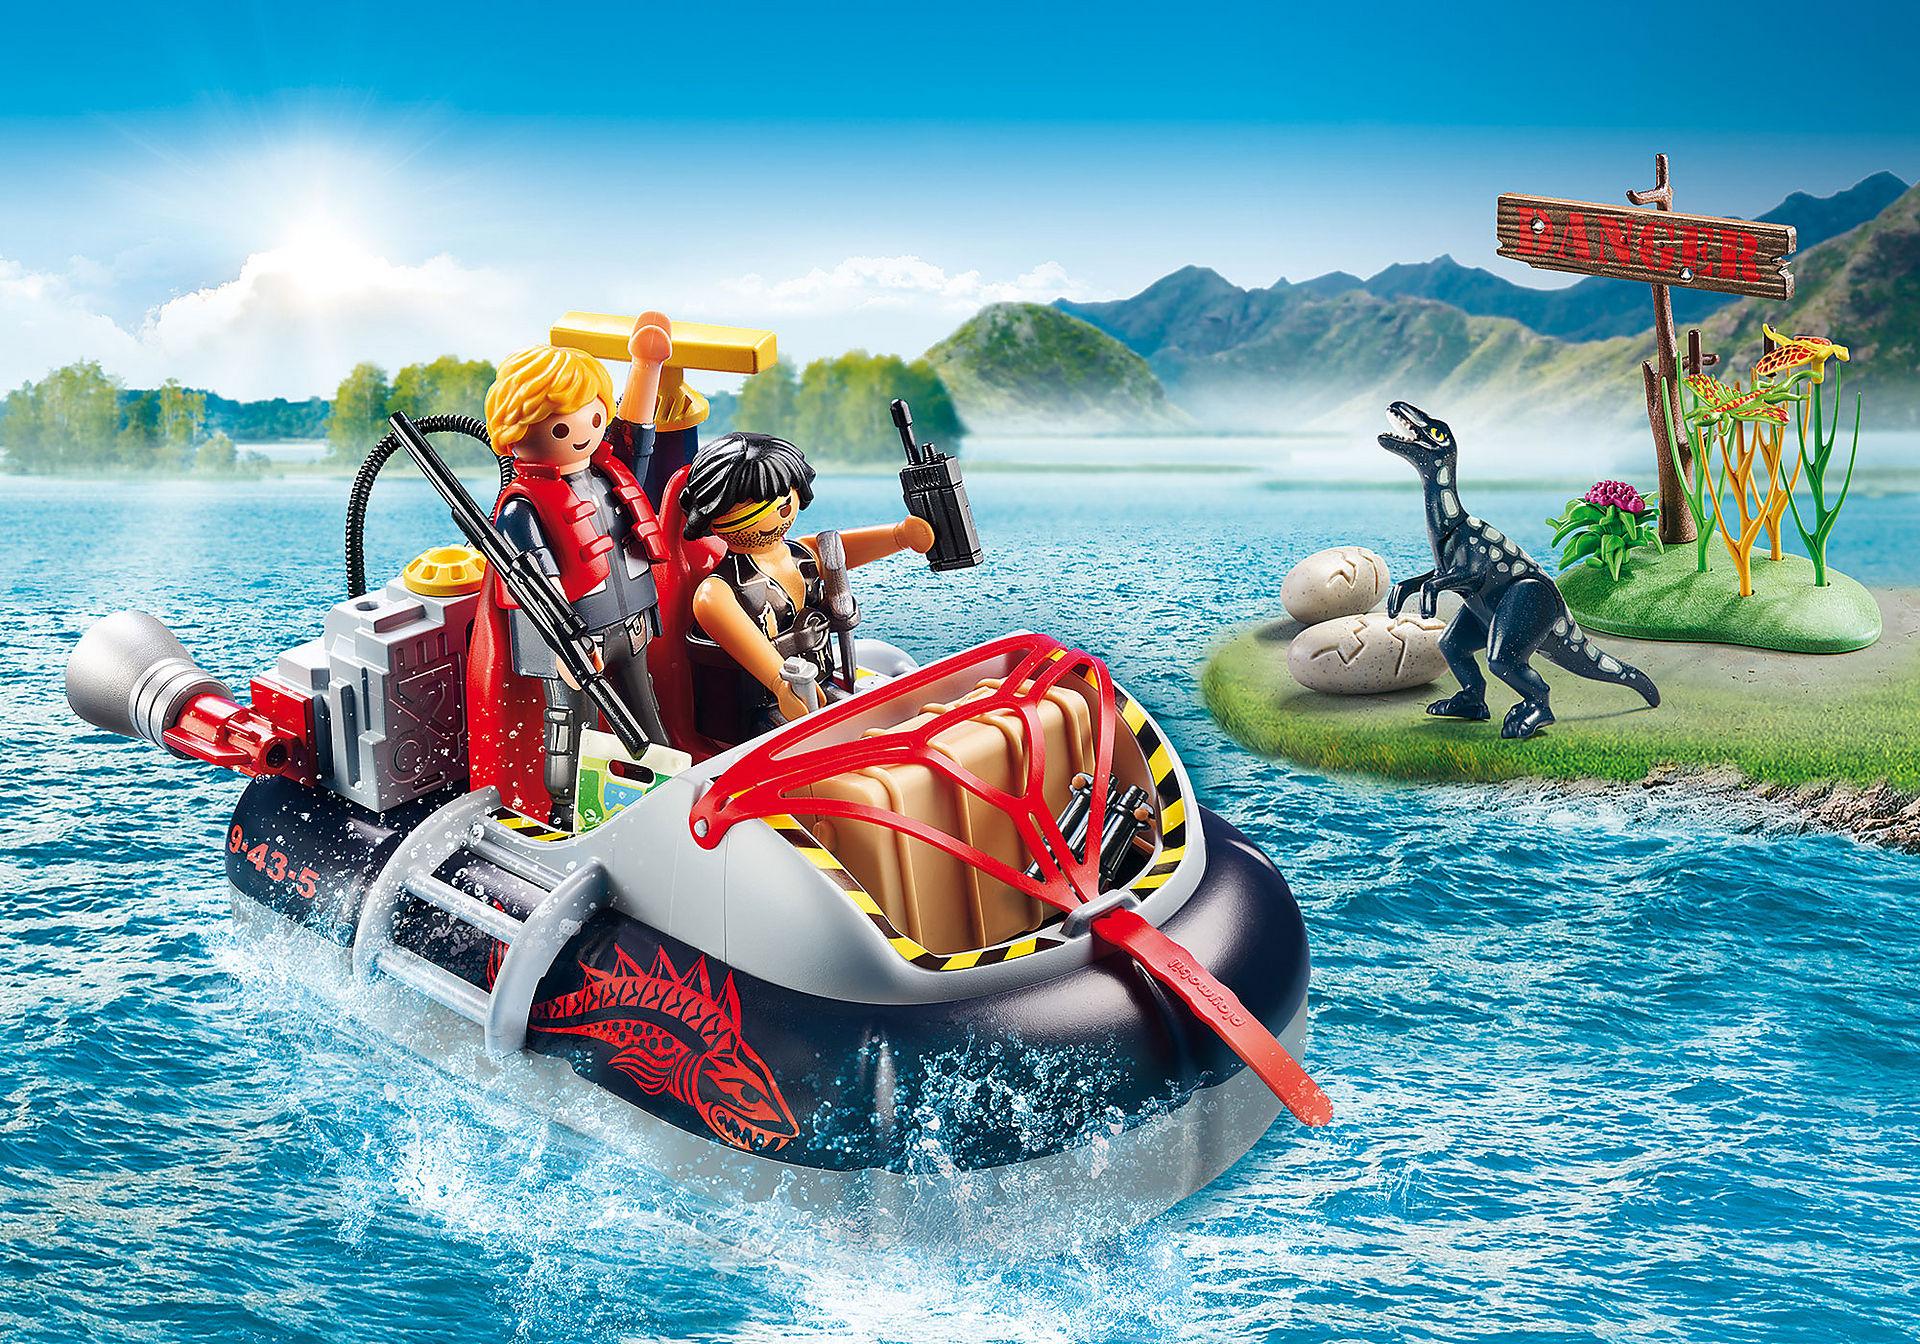 http://media.playmobil.com/i/playmobil/9435_product_detail/Luftkissenboot mit Unterwassermotor